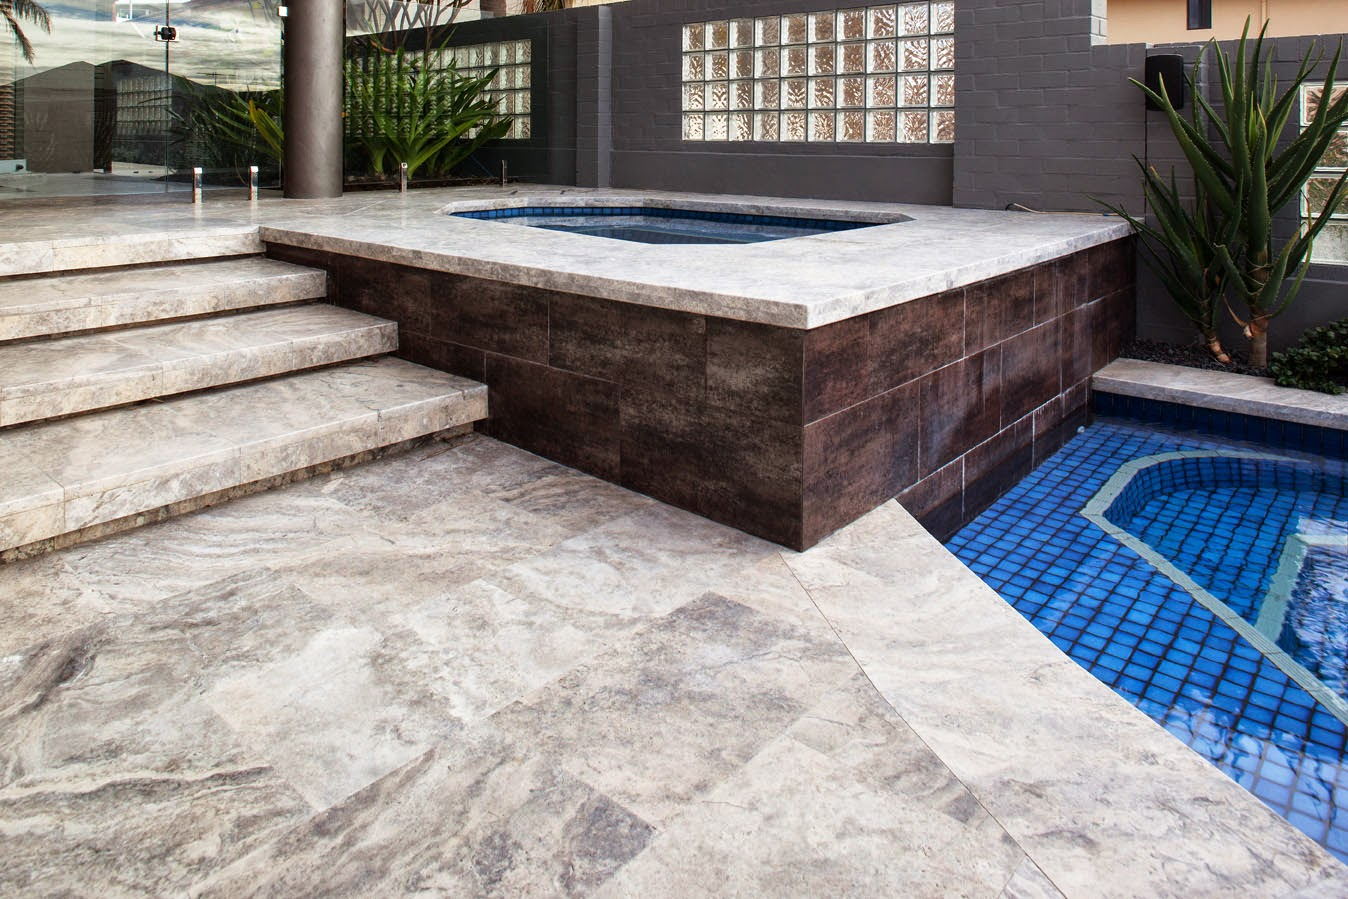 Pool Coping Tiles Pavers Melbourne Travertine Tiles